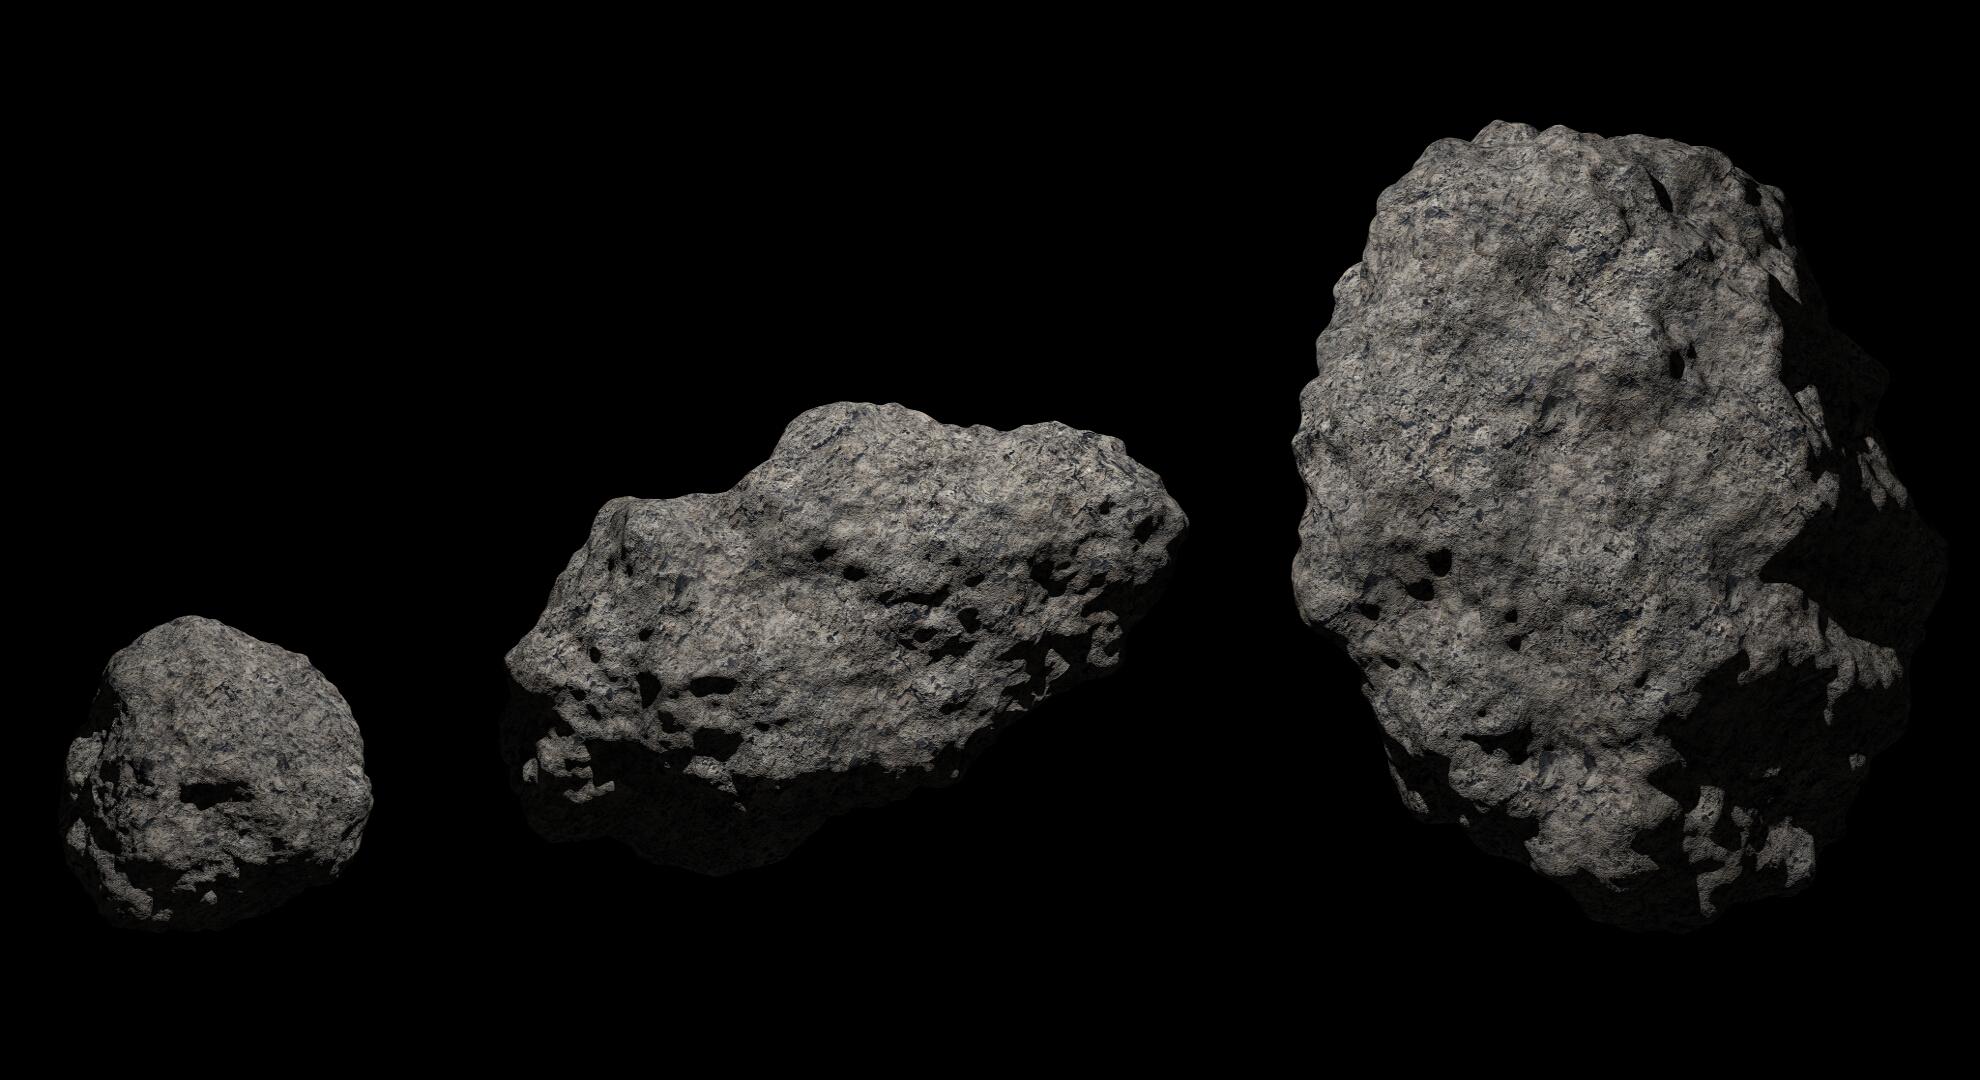 fantasy asteroid 2 3d model 3ds blend dae fbx obj 267195